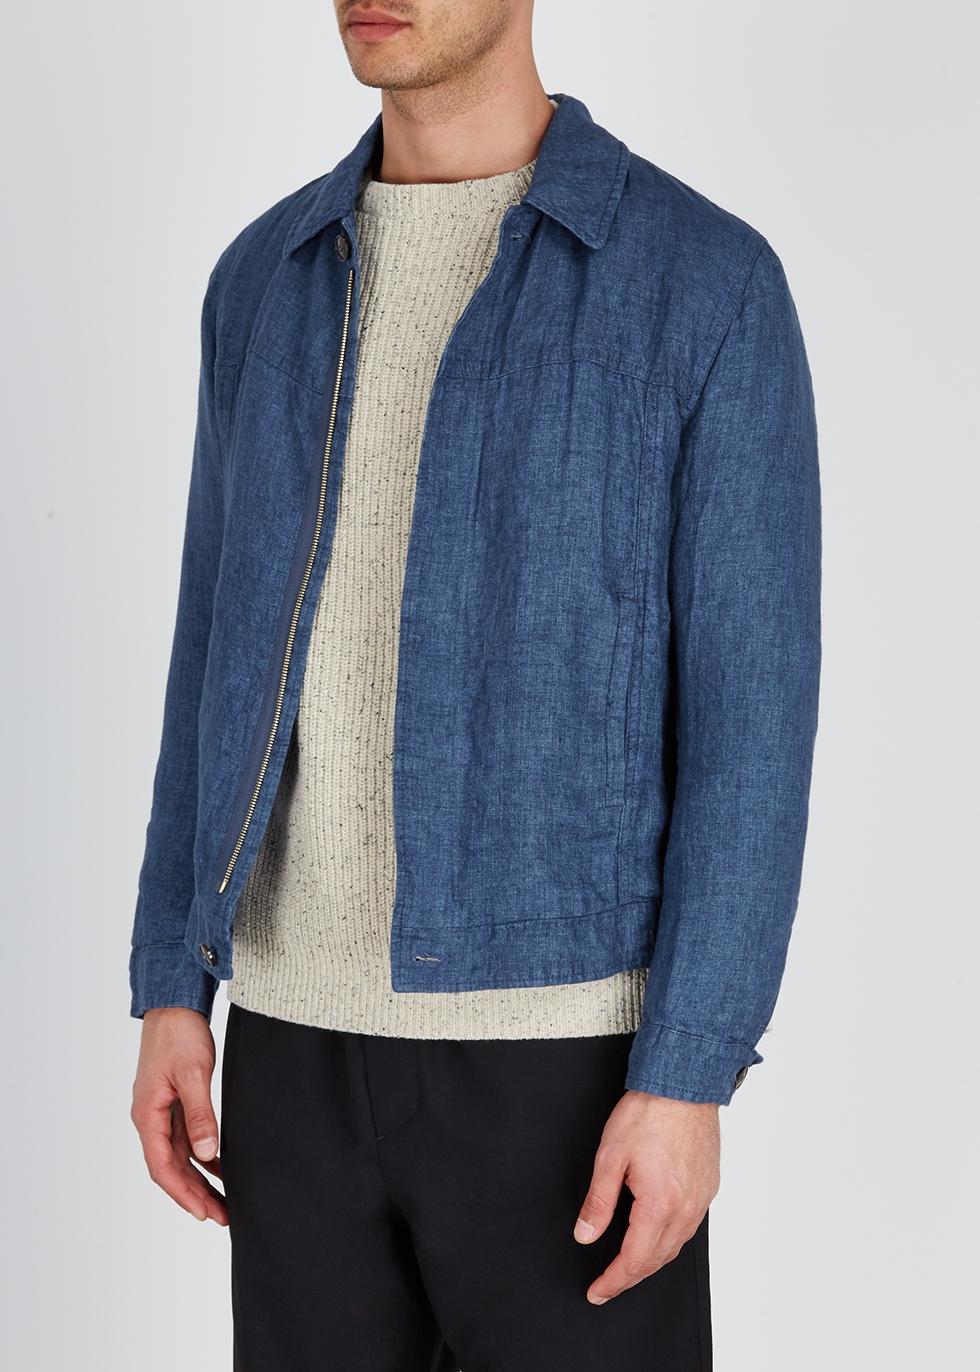 Blue linen jacket - A Kind of Guise